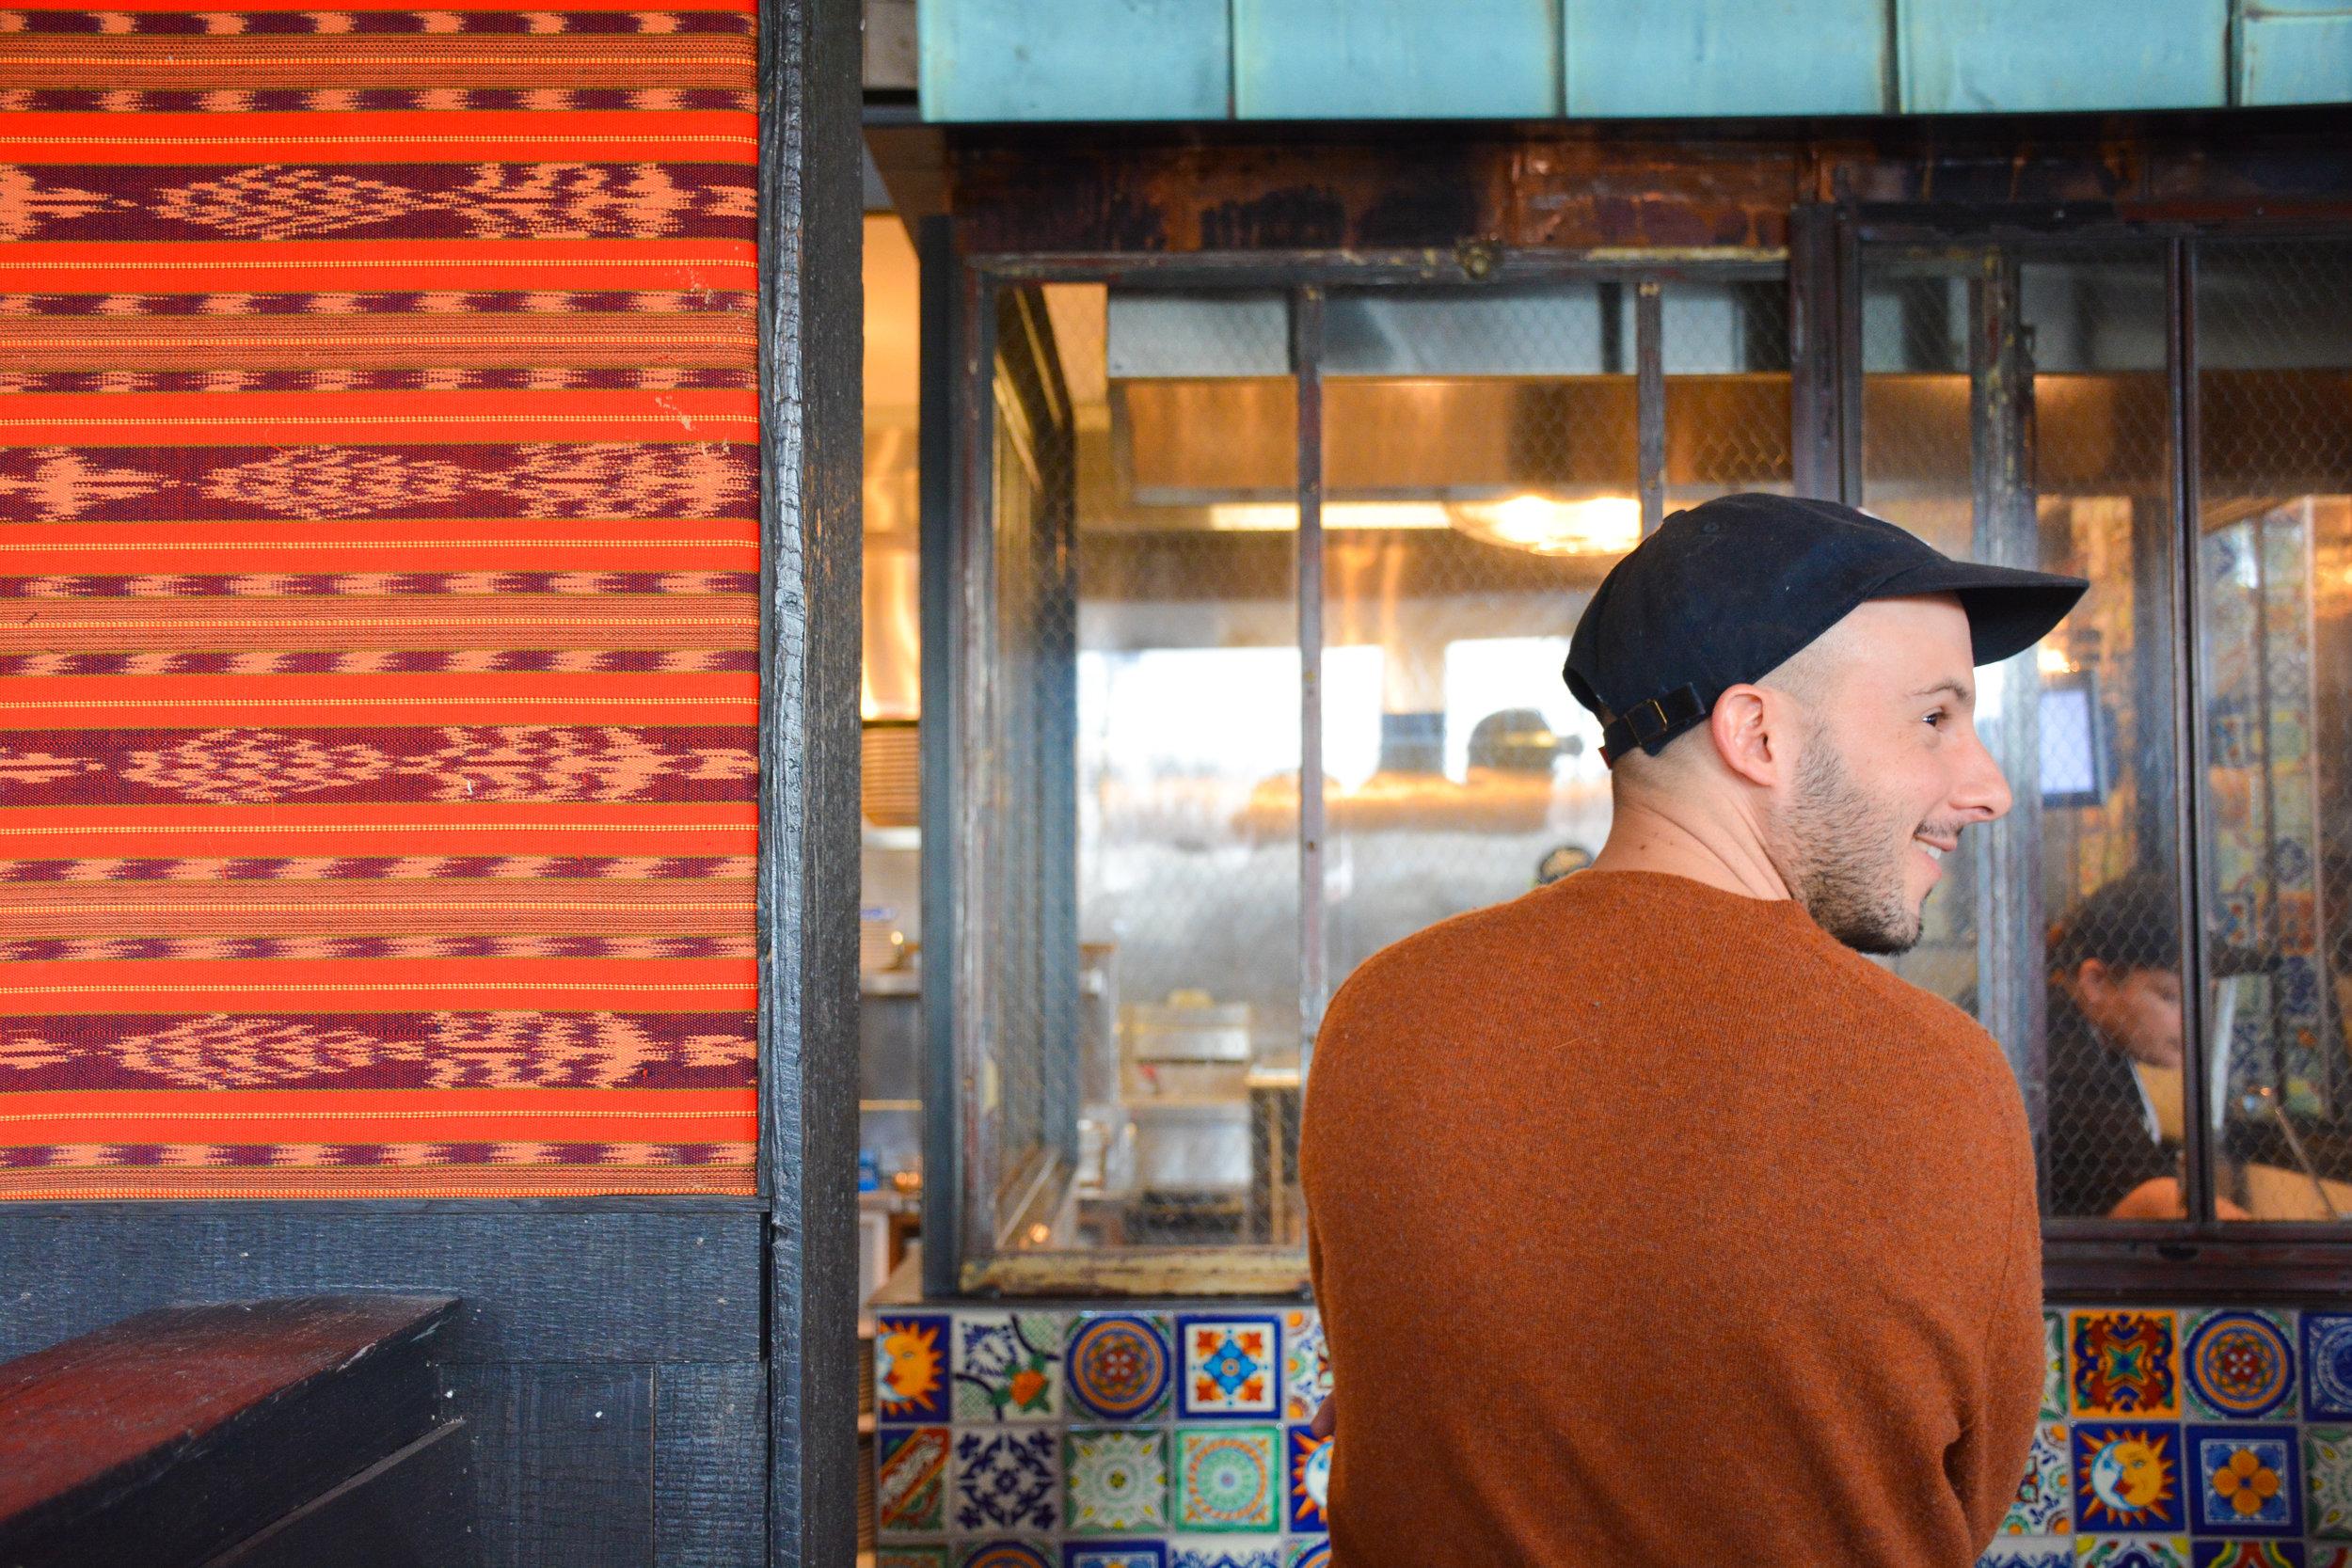 Ari Gejdenson, founder of Mindful Restaurant Group, at La Puerta Verde